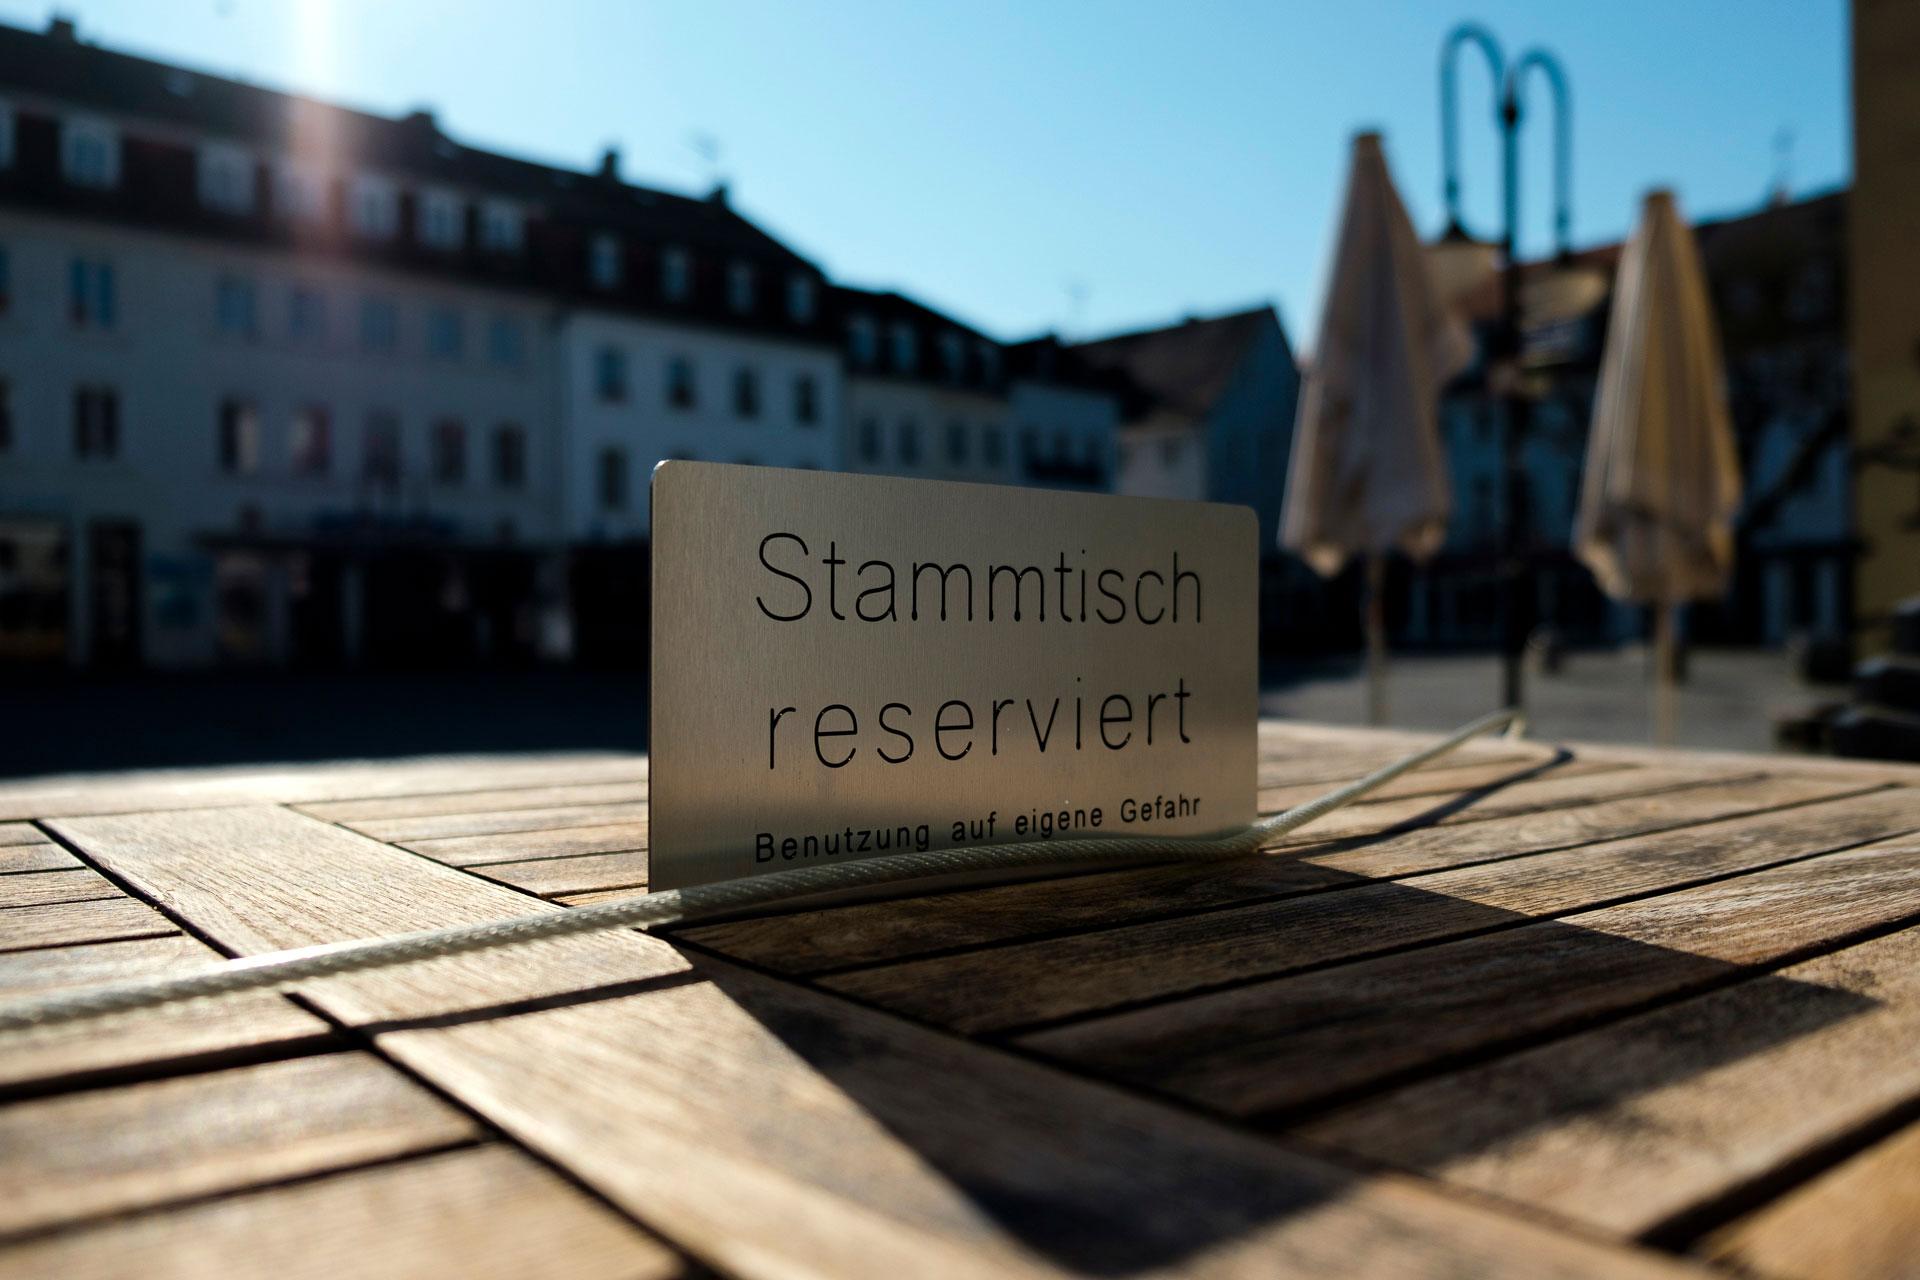 innenstadt_saarbruecken_stjohannermarkt_DSF7112_foto_sebastian_knoebber